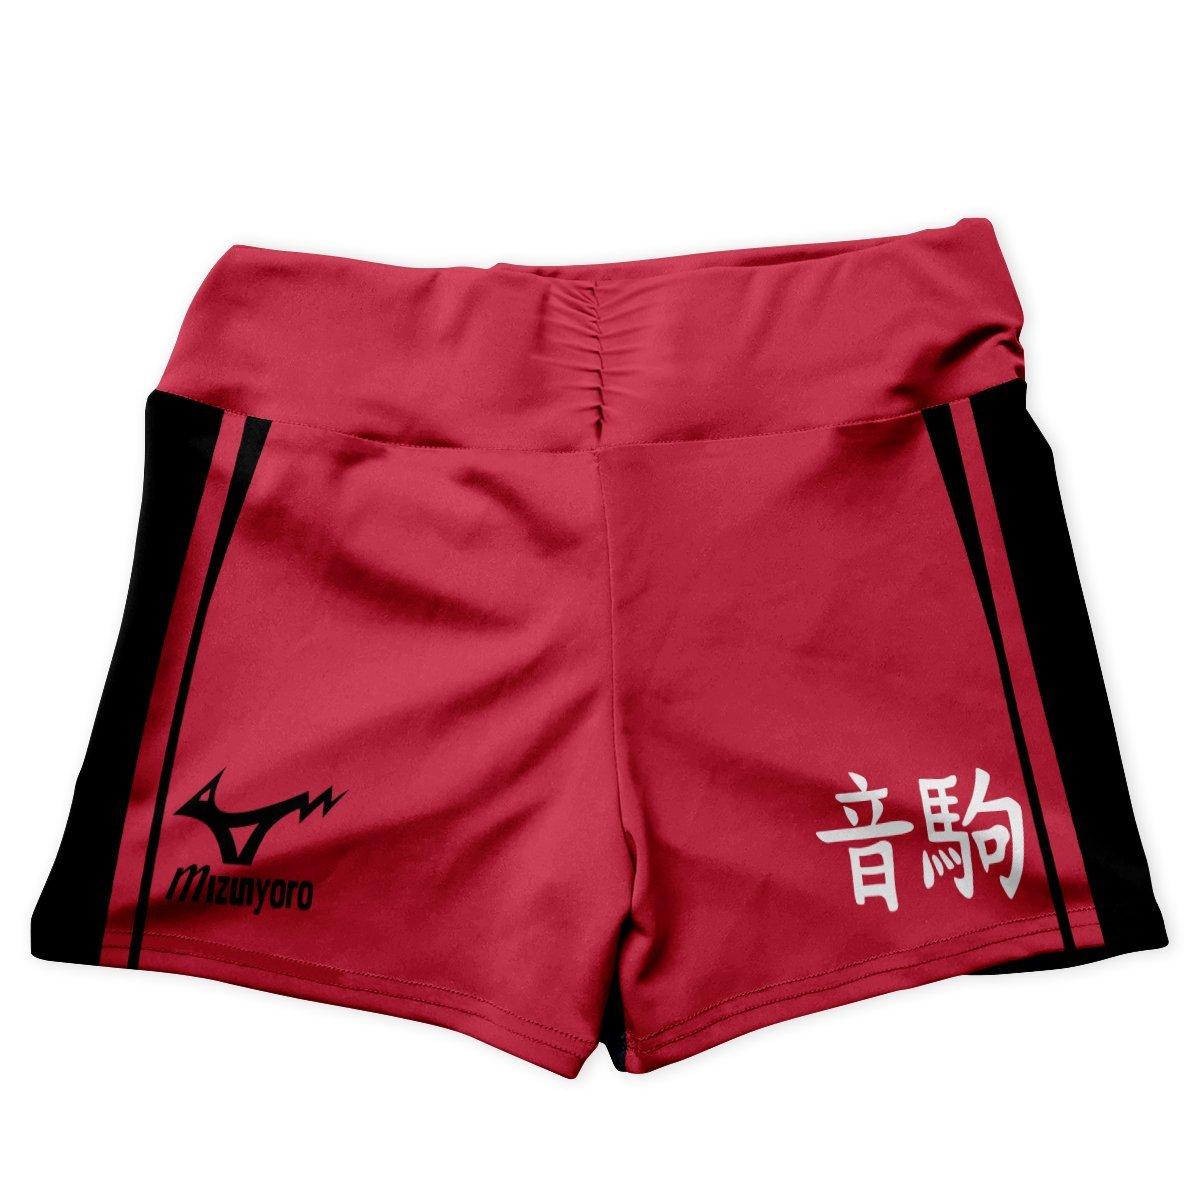 team nekoma active wear set 348667 - Anime Swimsuits